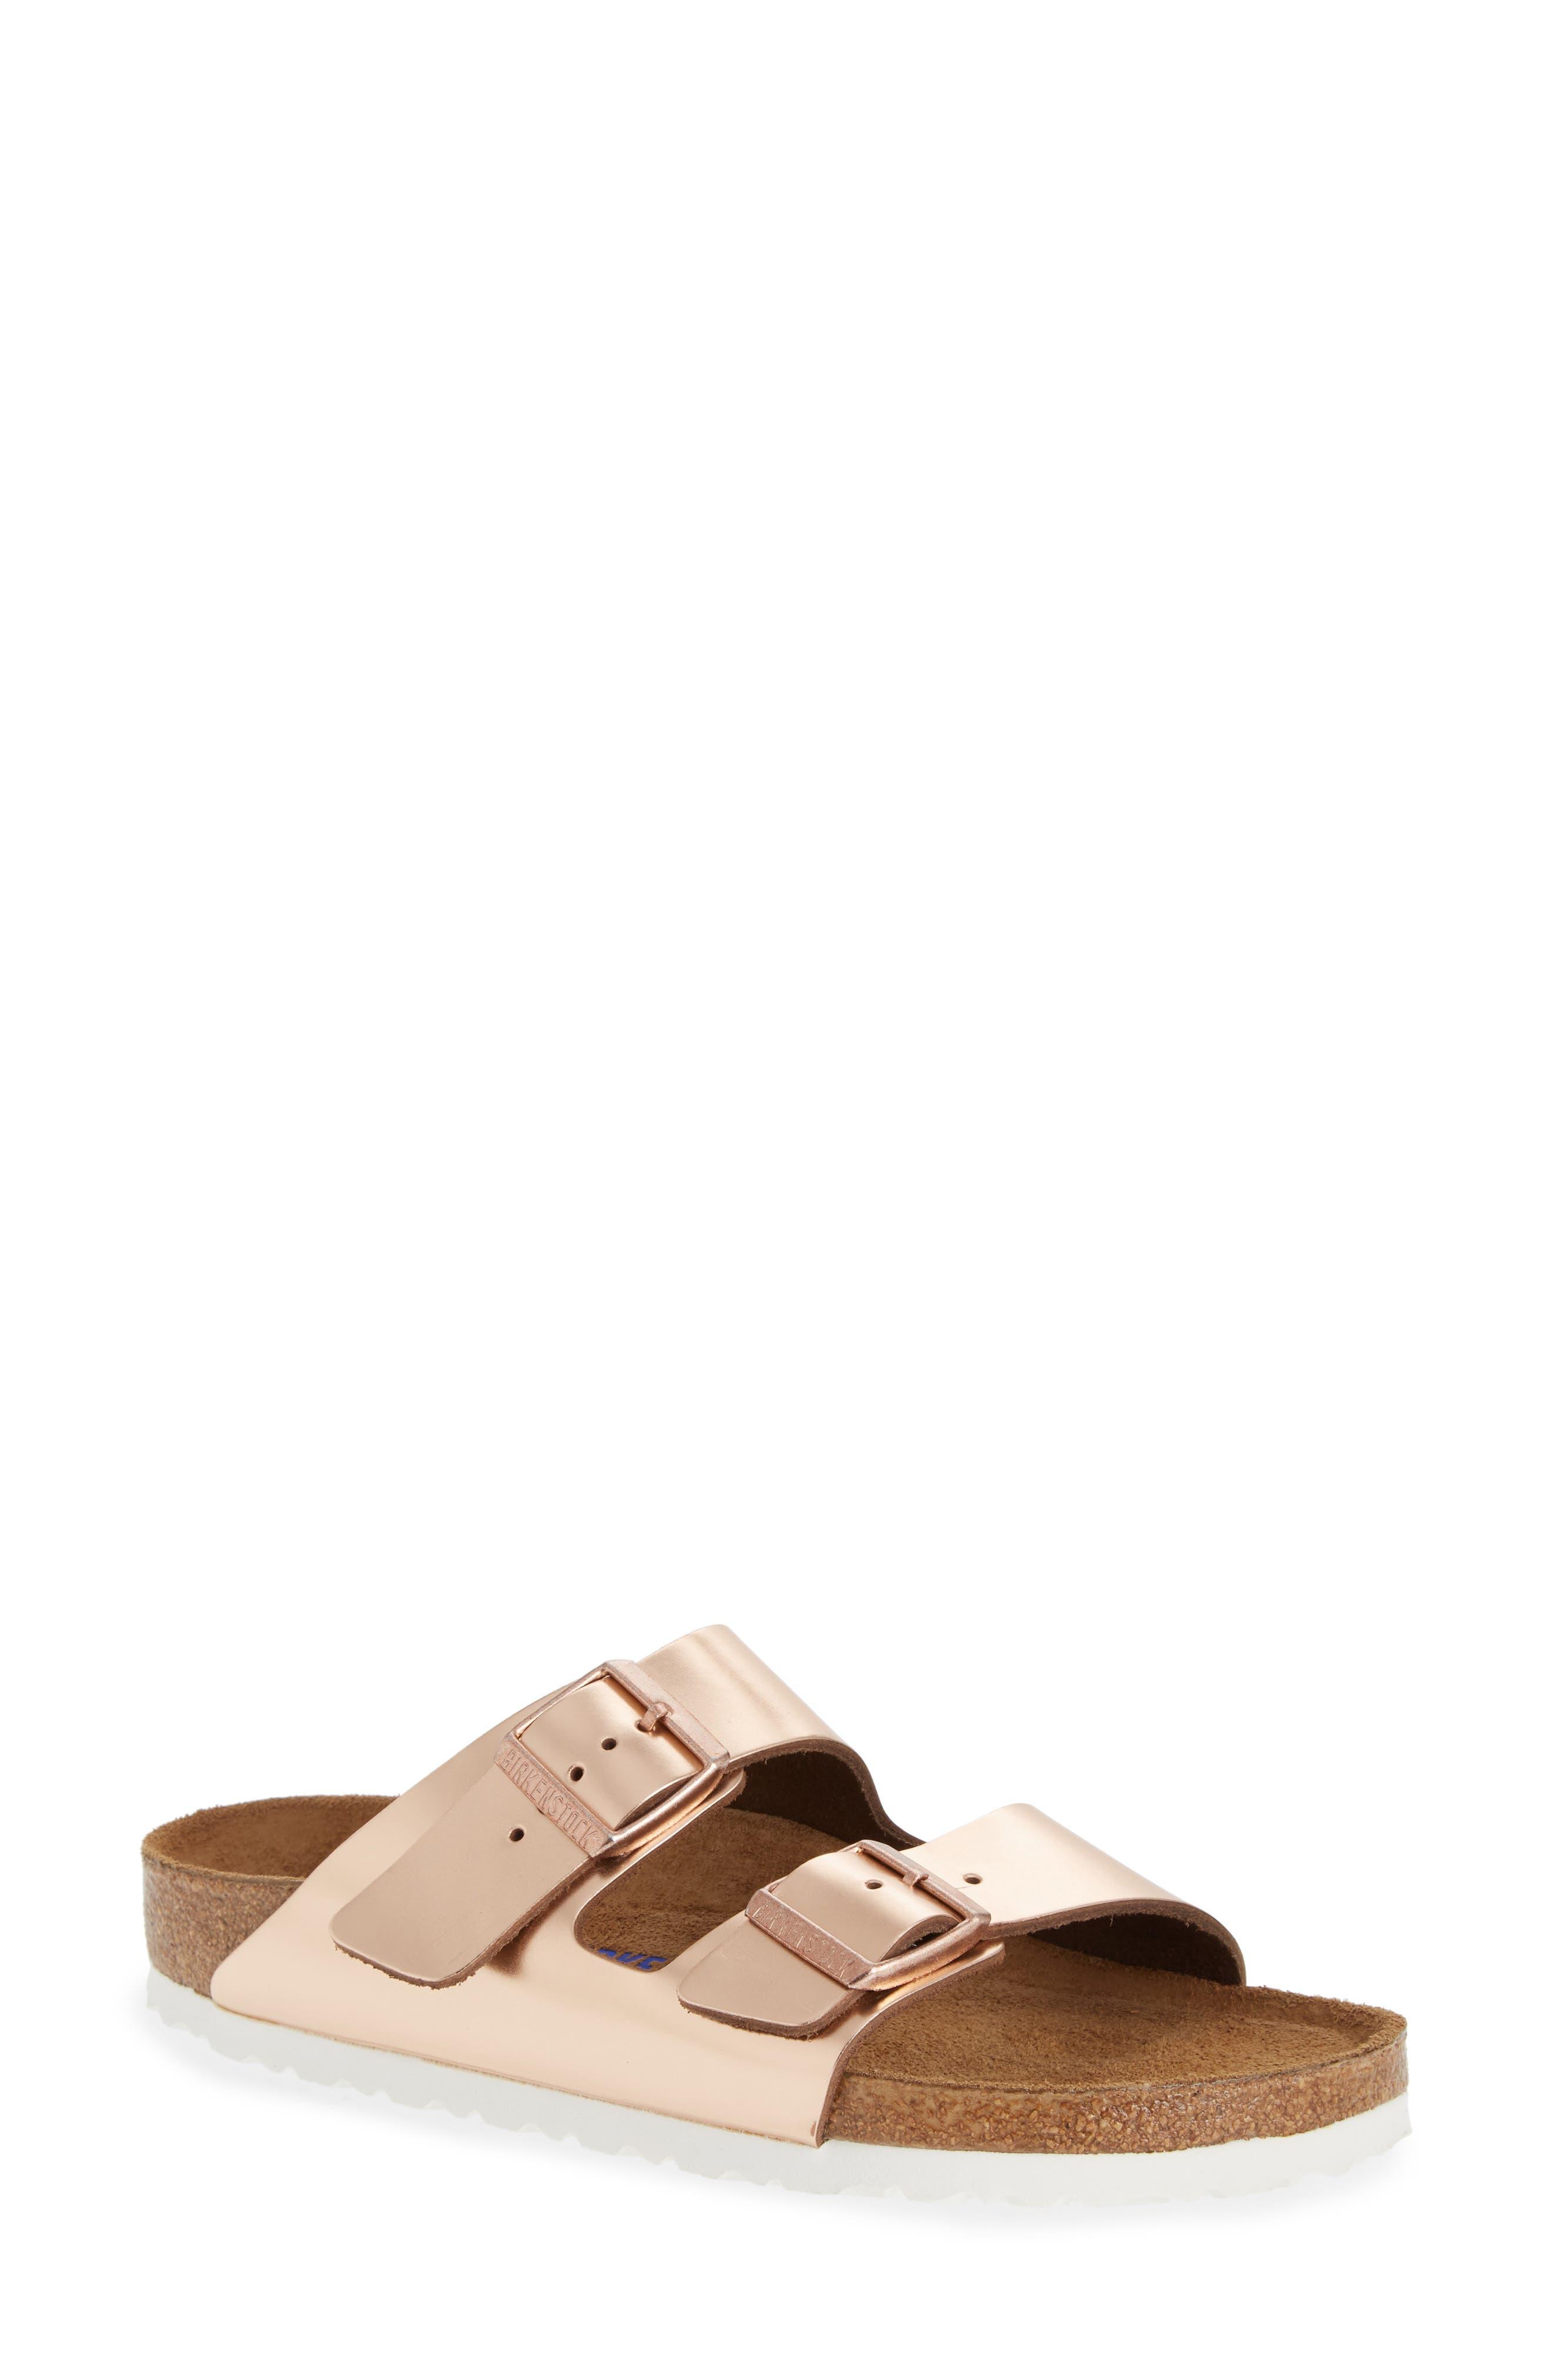 BIRKENSTOCK 'Arizona' Soft Footbed Sandal, Main, color, COPPER LEATHER